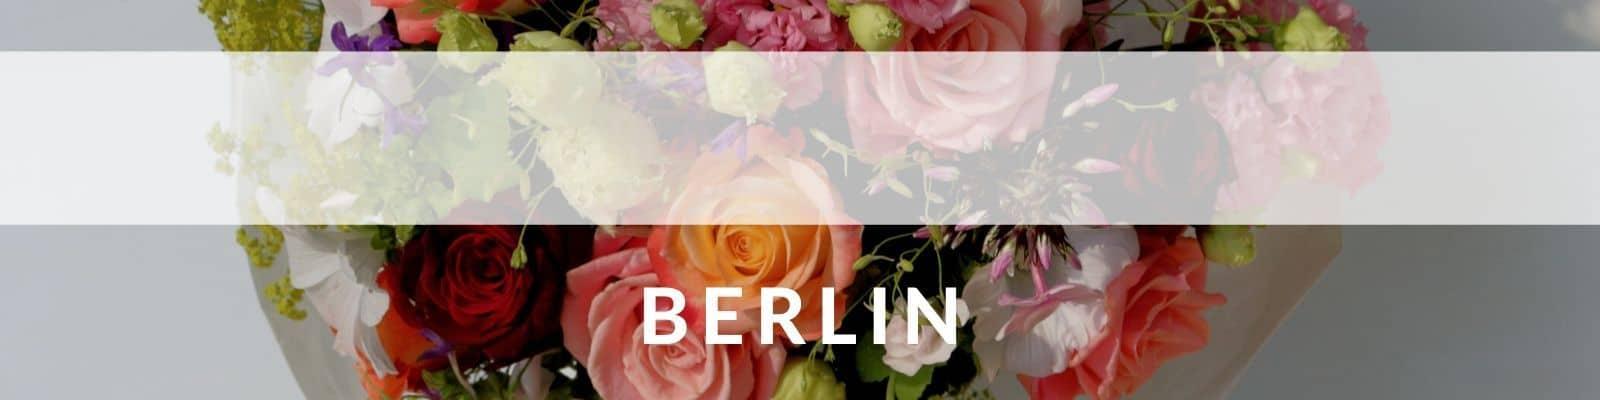 Blumen verschicken Berlin - Blumenversand